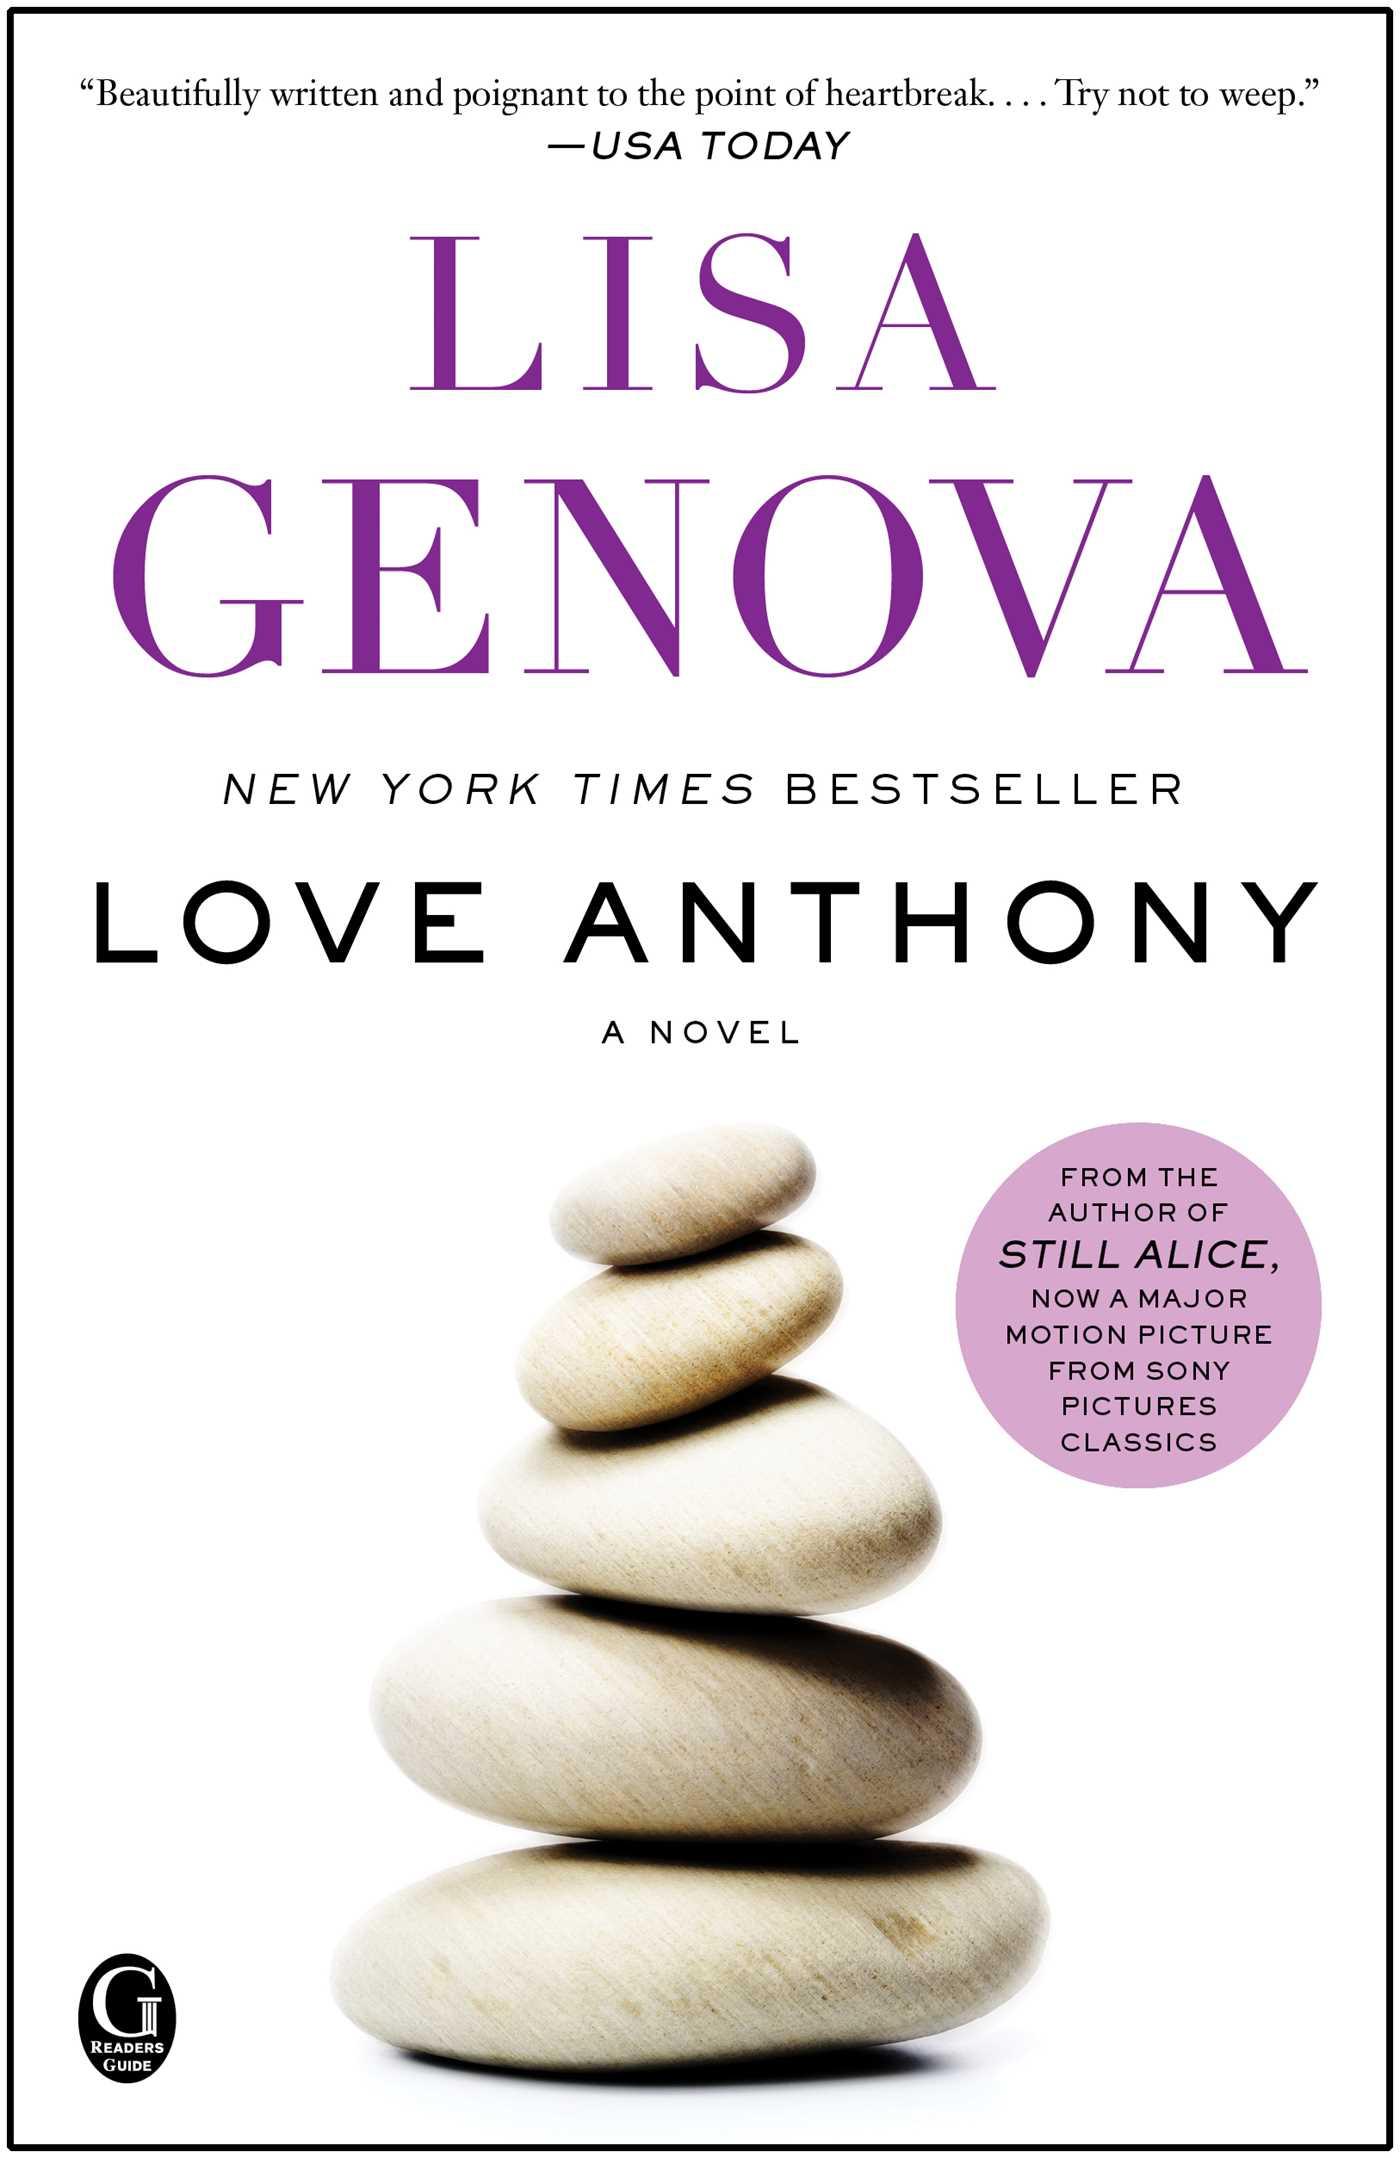 Love anthony 9781439164709 hr